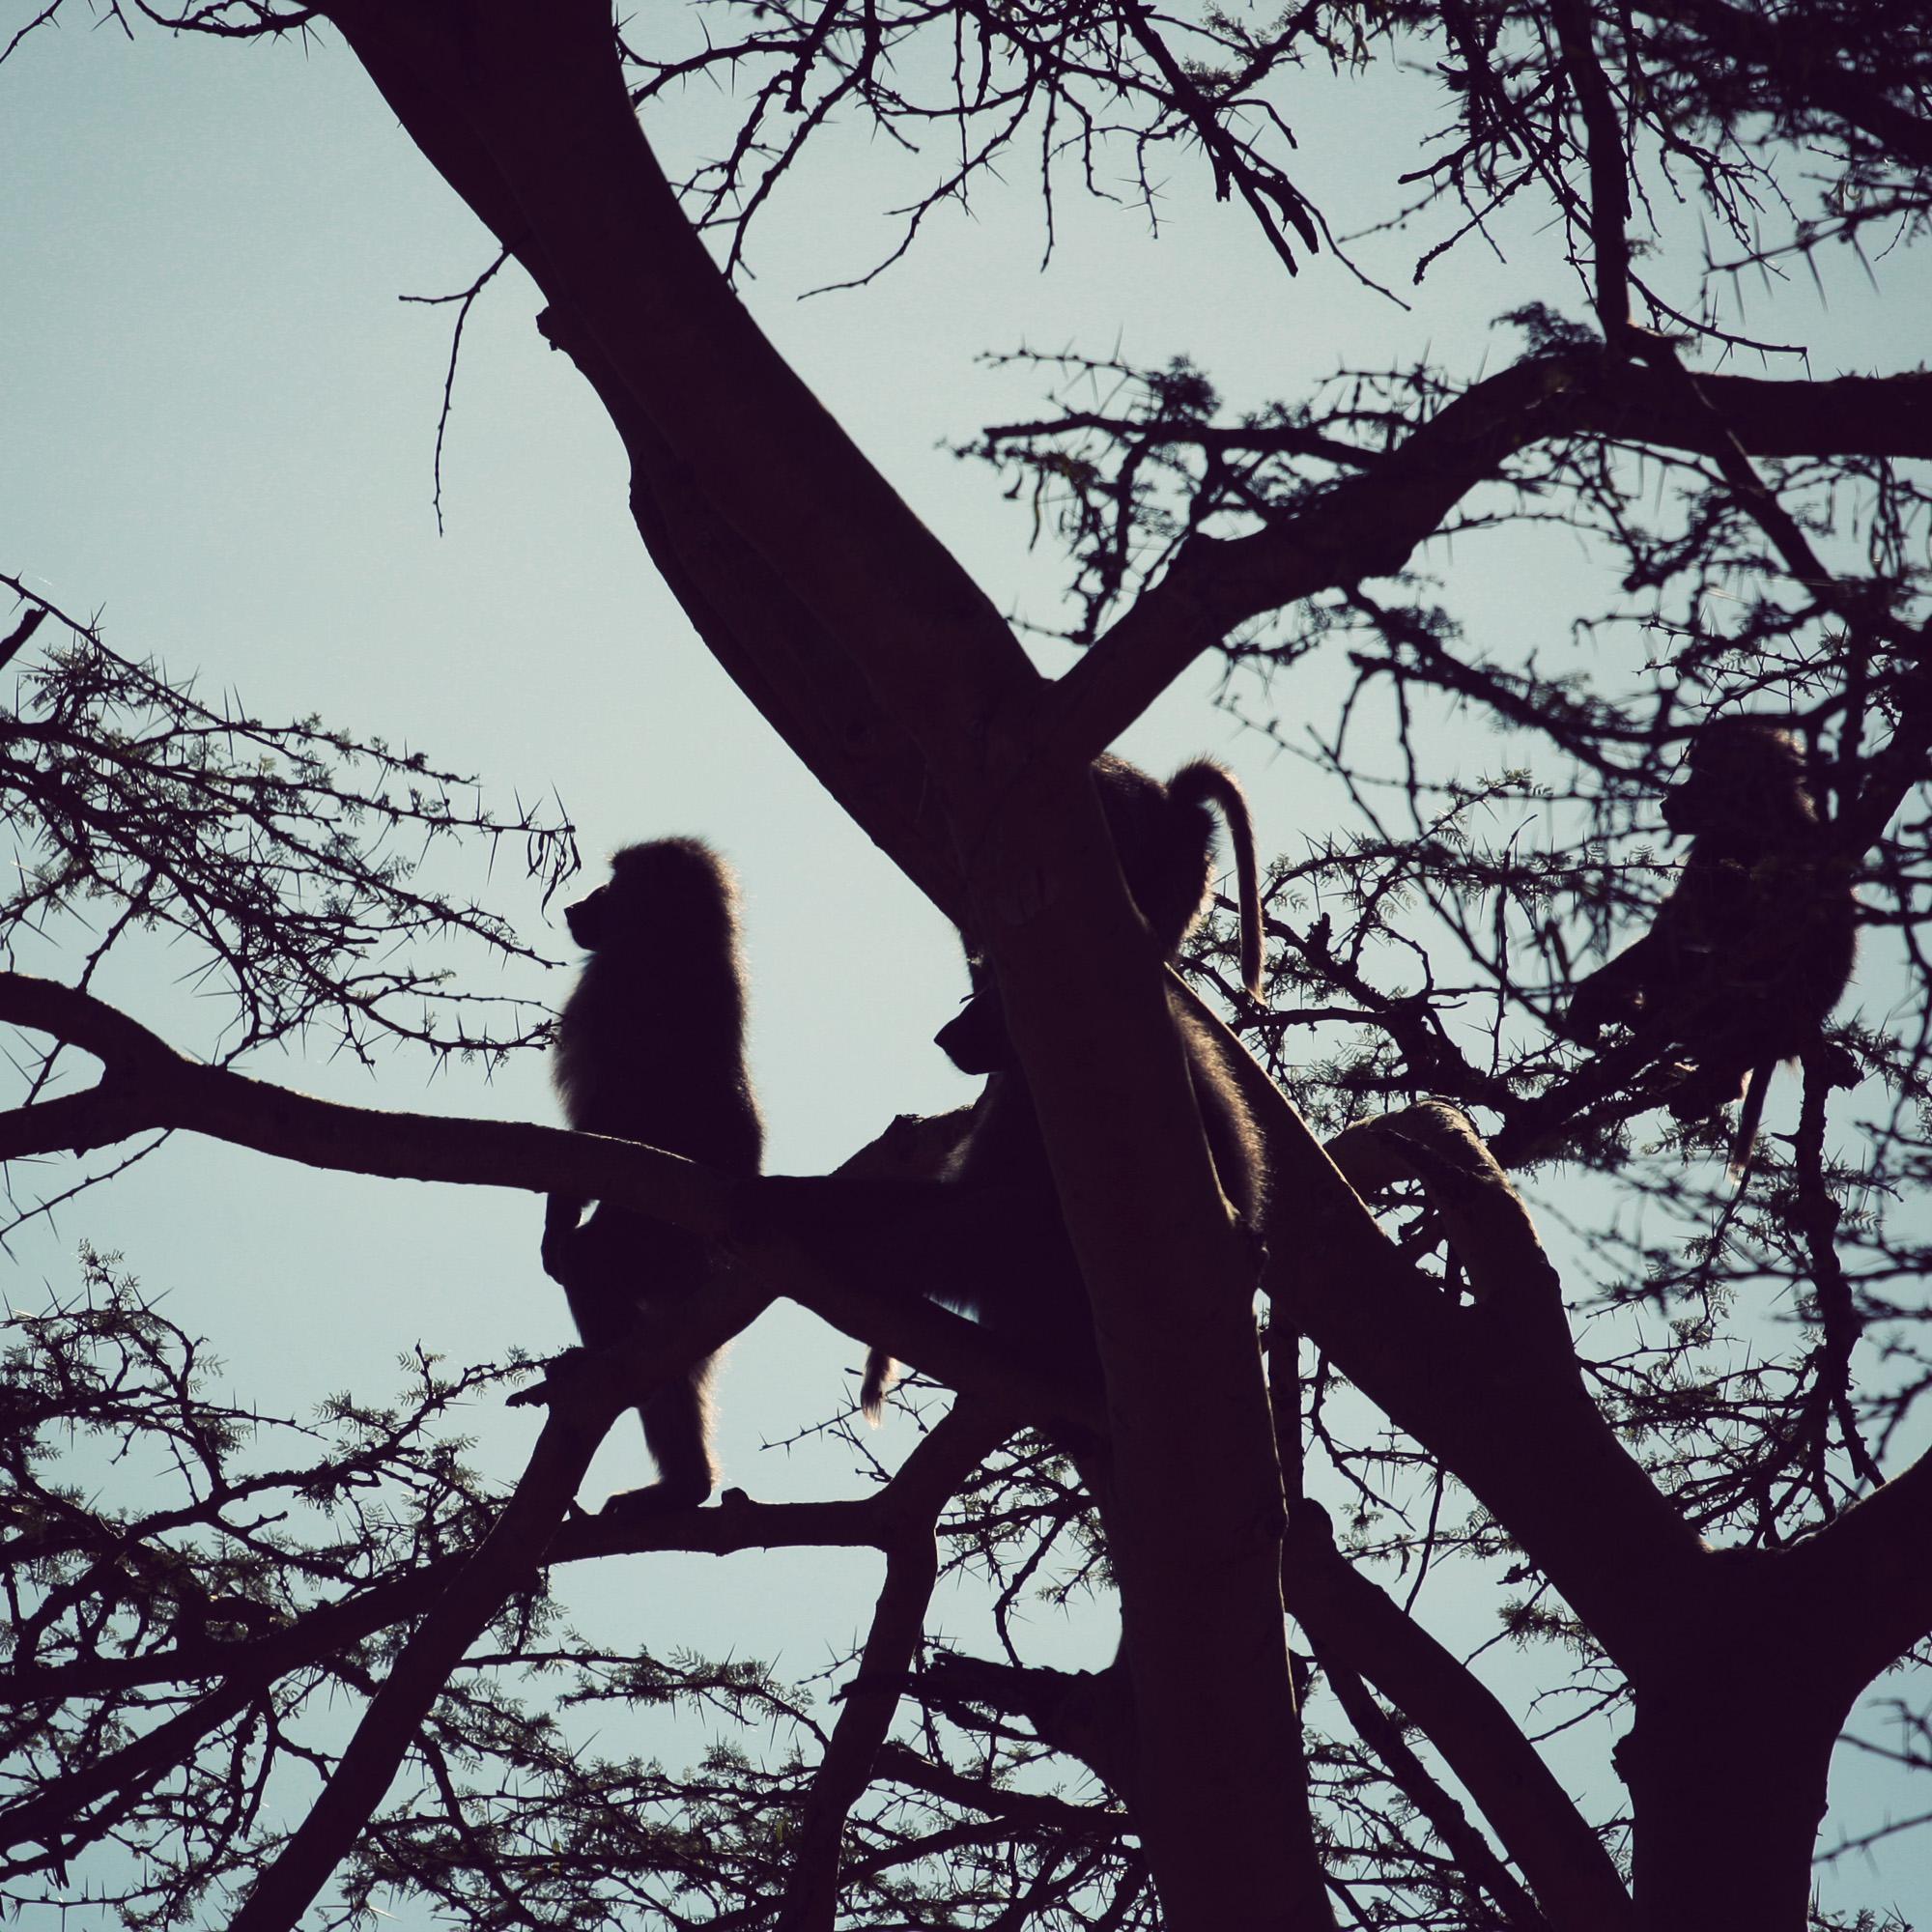 Day02_Sweetwater_Baboon-Tree_04.jpg